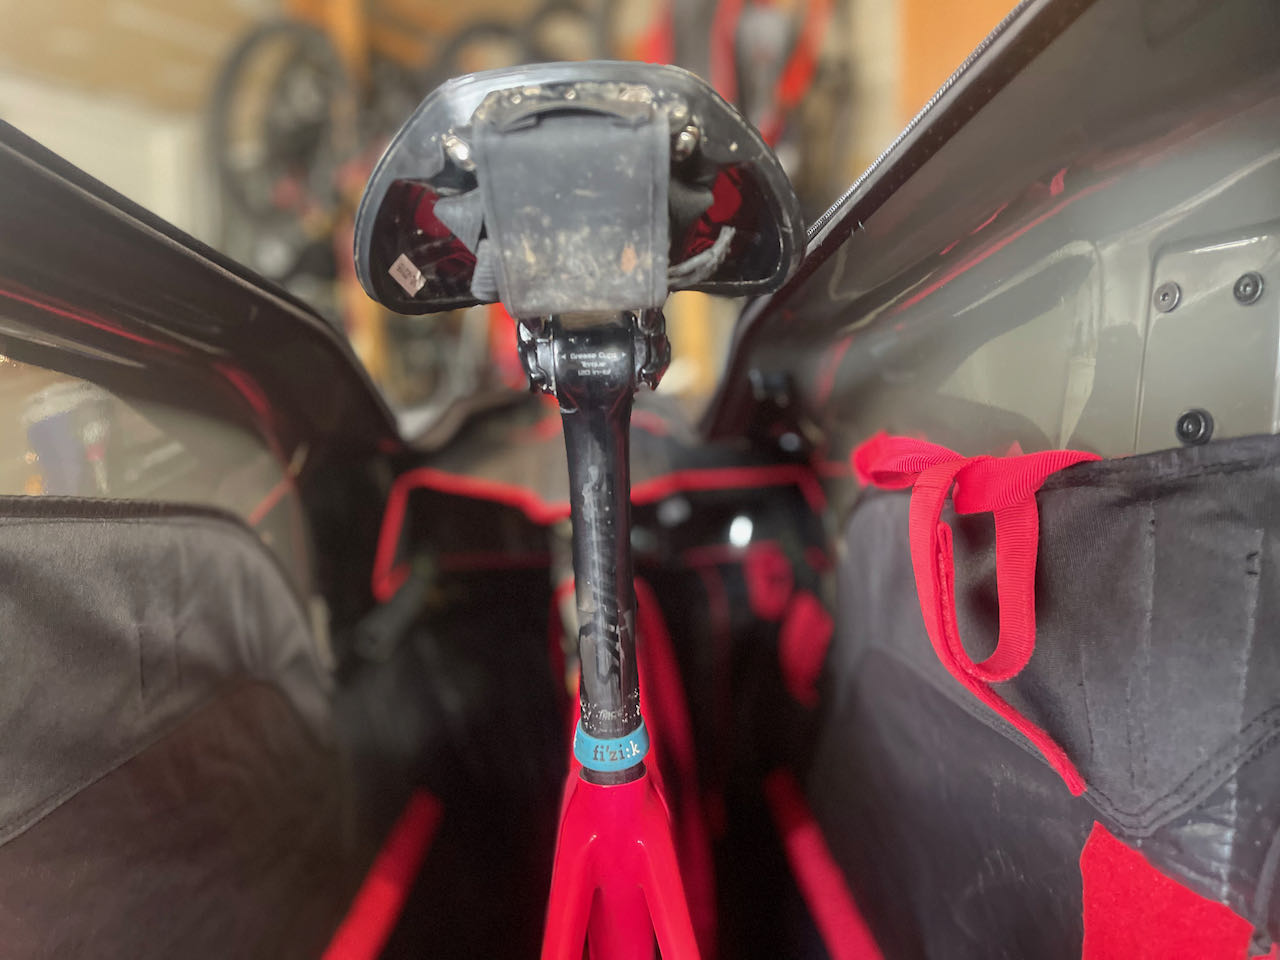 EVOCs Road Bike Bag Pro saddle view of full bag